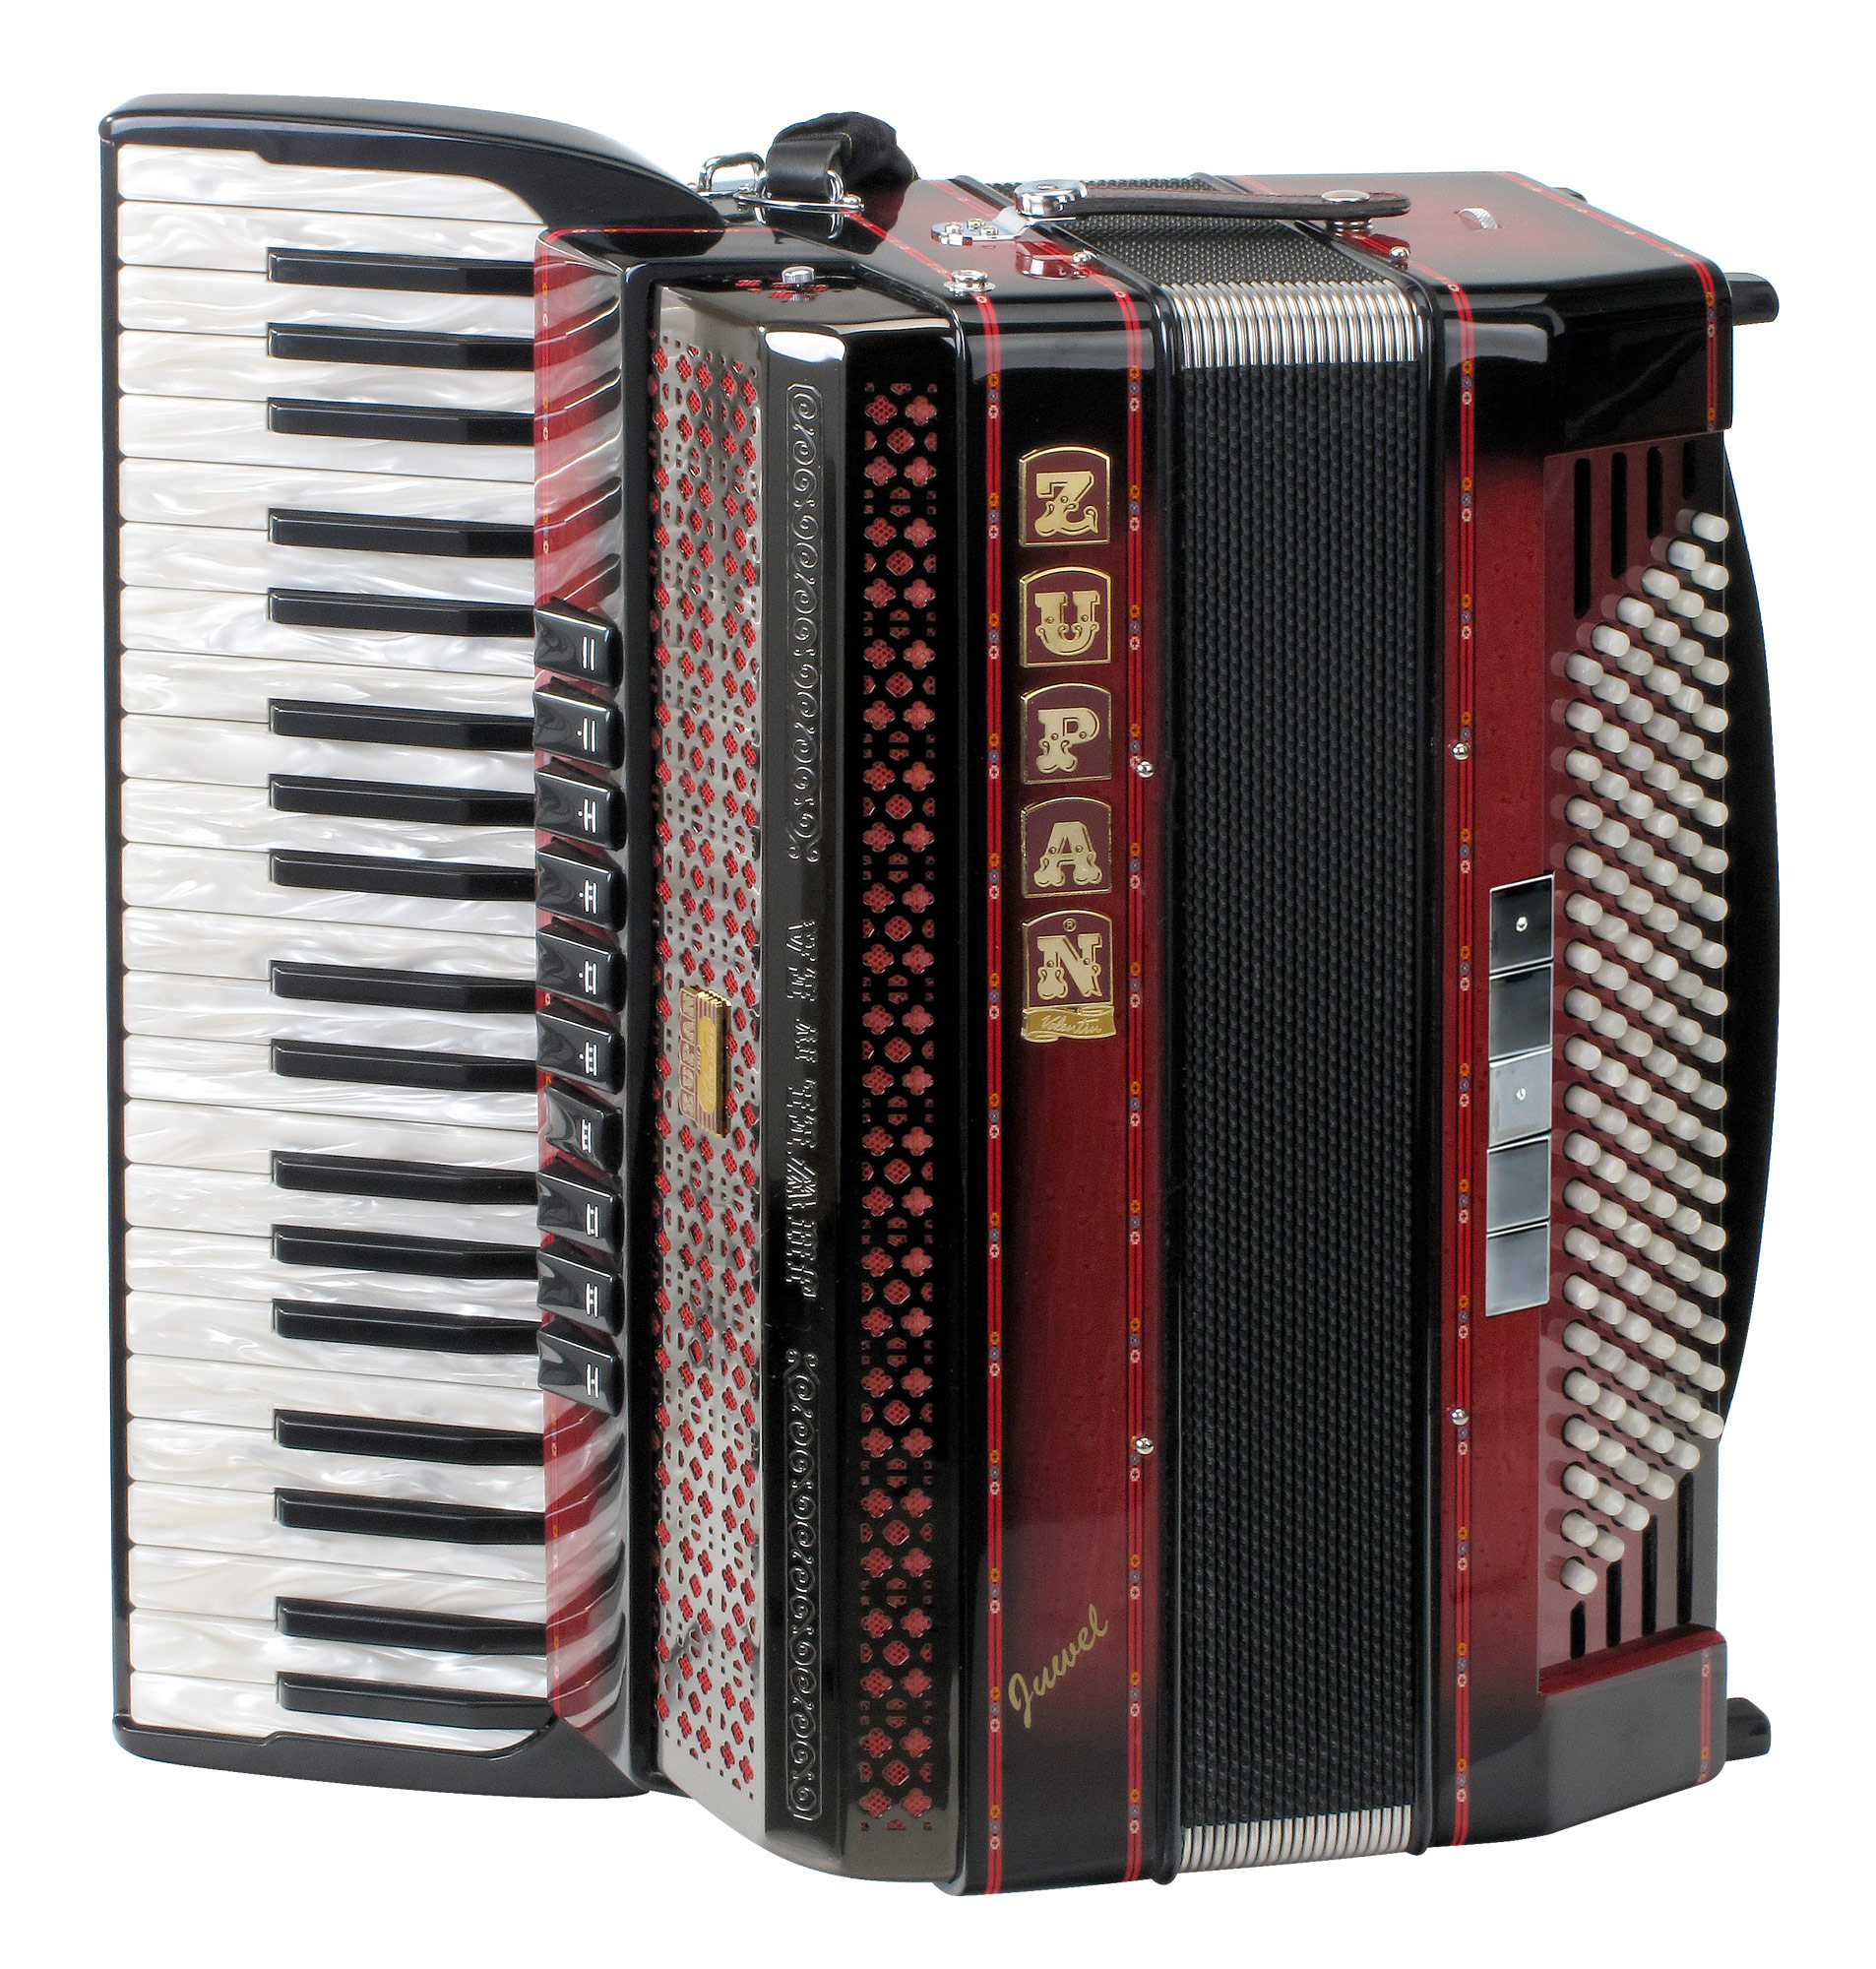 Akkordeons - Zupan Juwel IV 120 EA MHR Cassotto Akkordeon Shadow Red Retoure (Zustand wie neu) - Onlineshop Musikhaus Kirstein